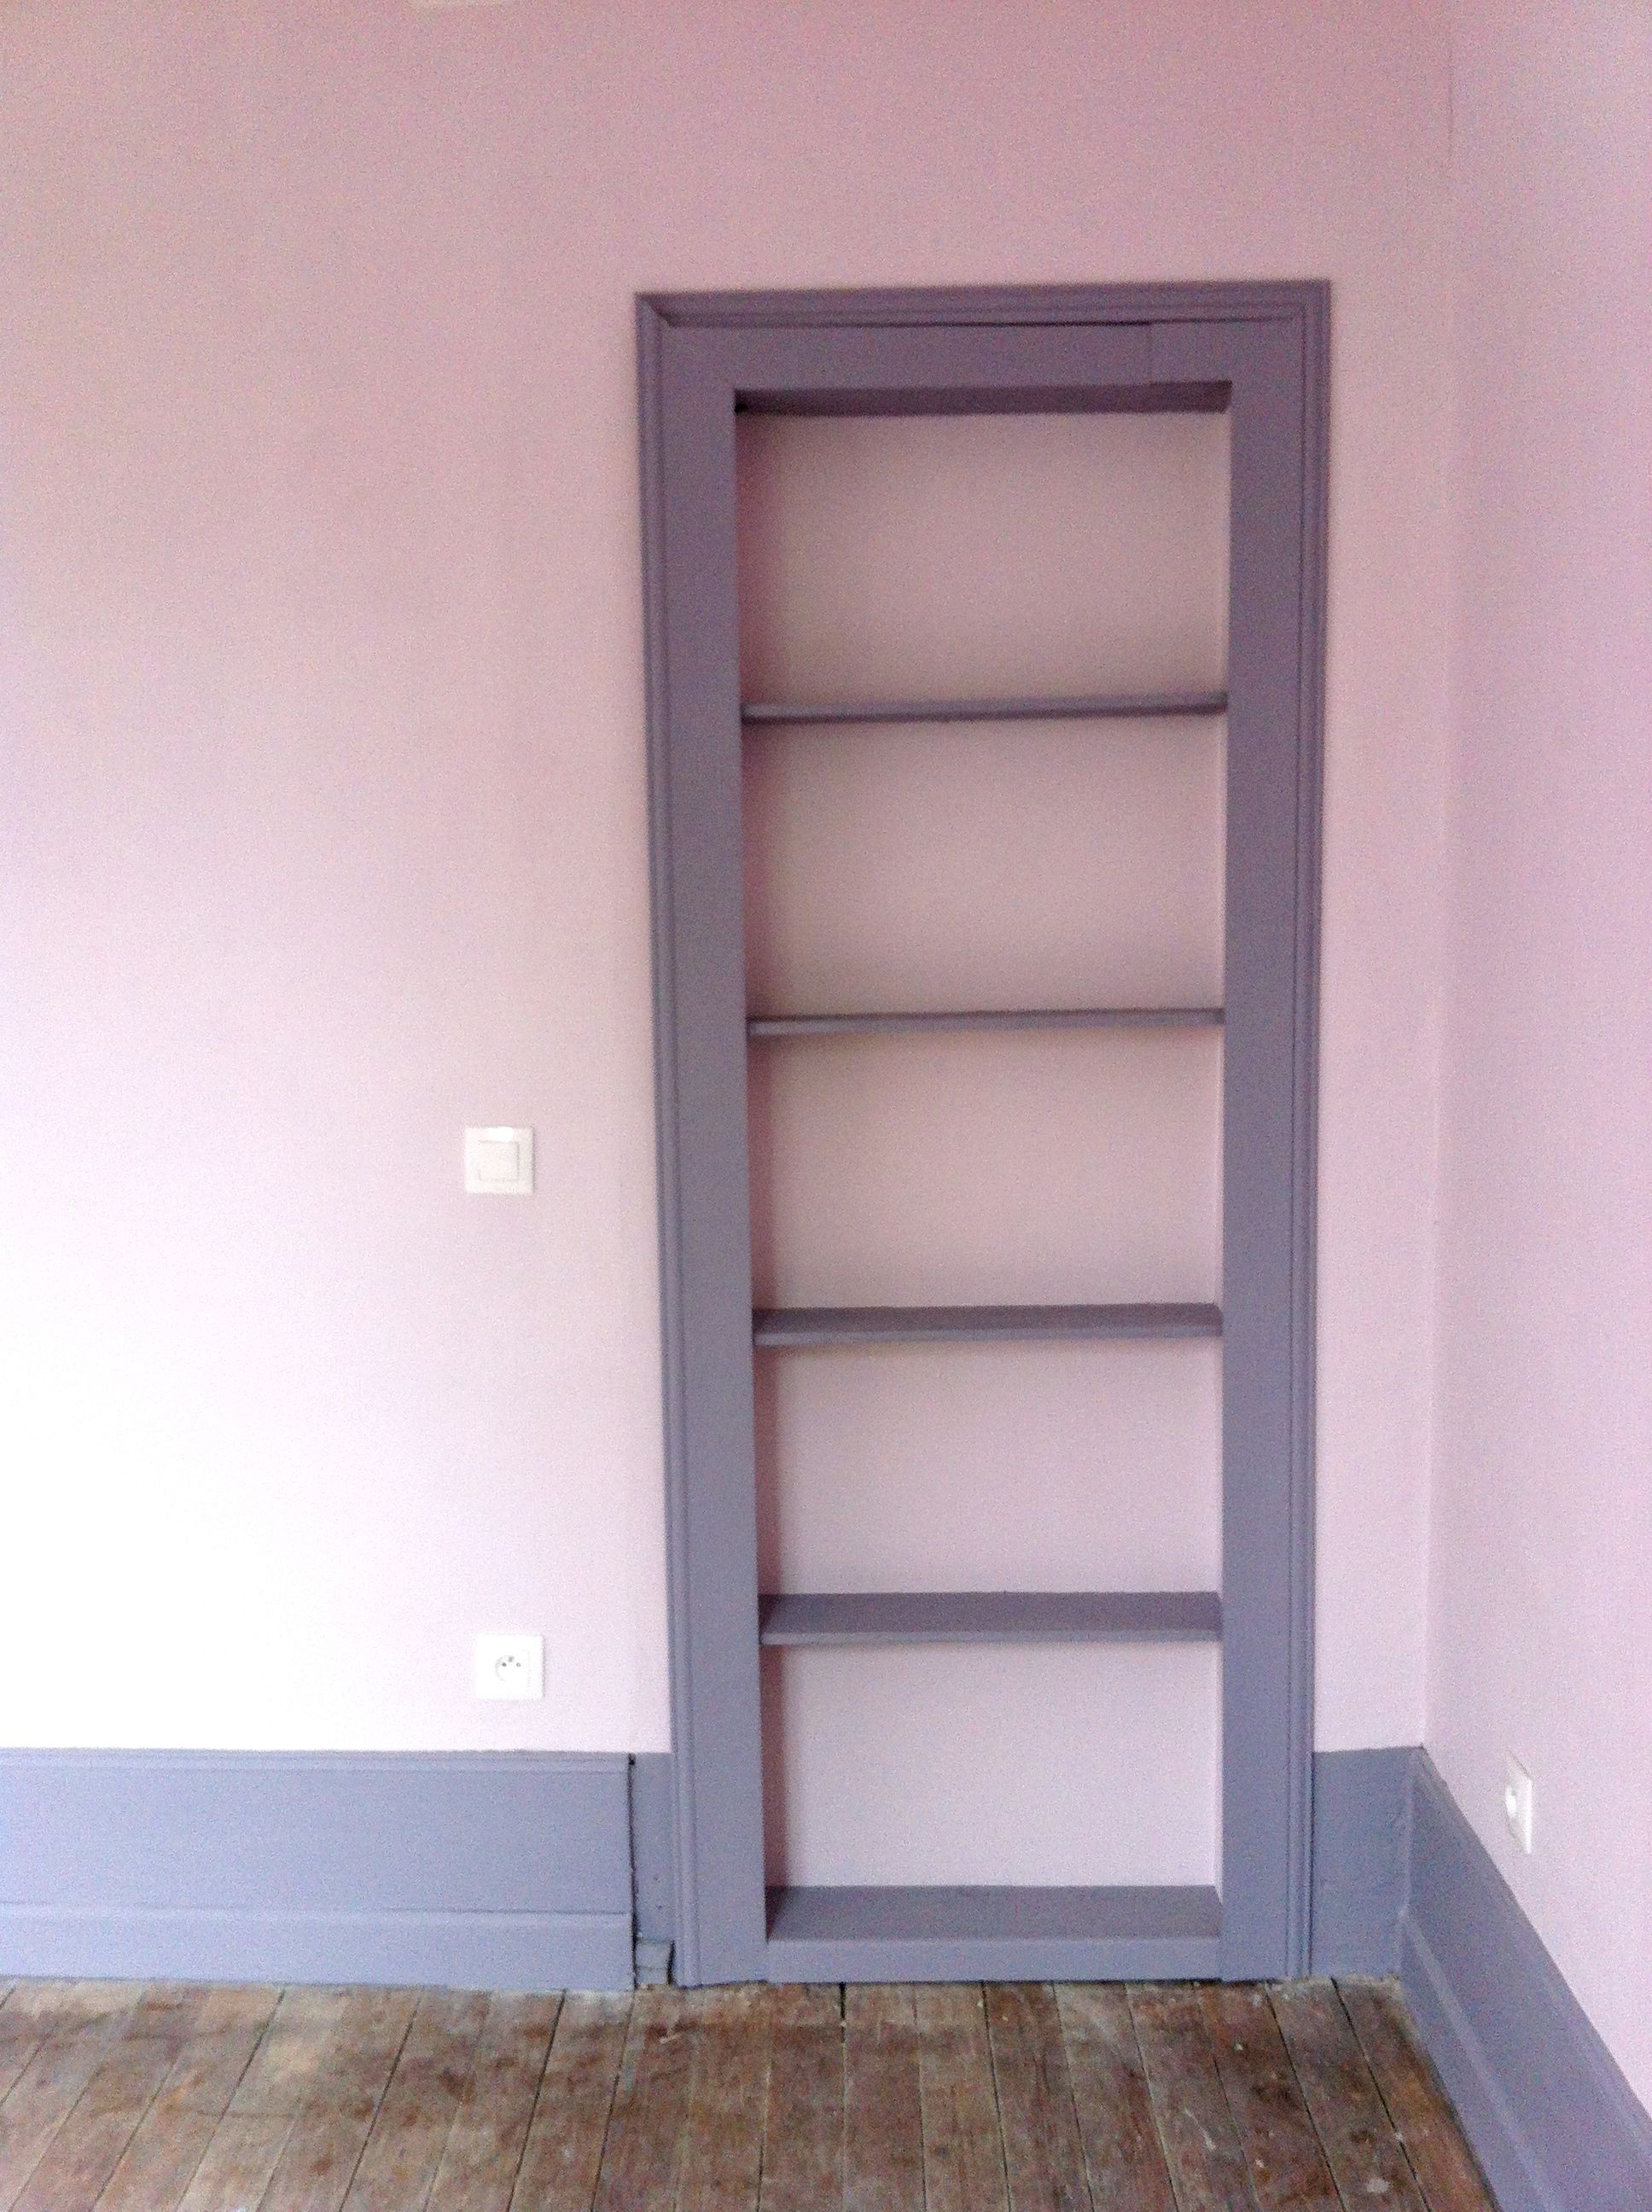 Chambre   Porte Dérobée / Bedroom   Hidden Closet